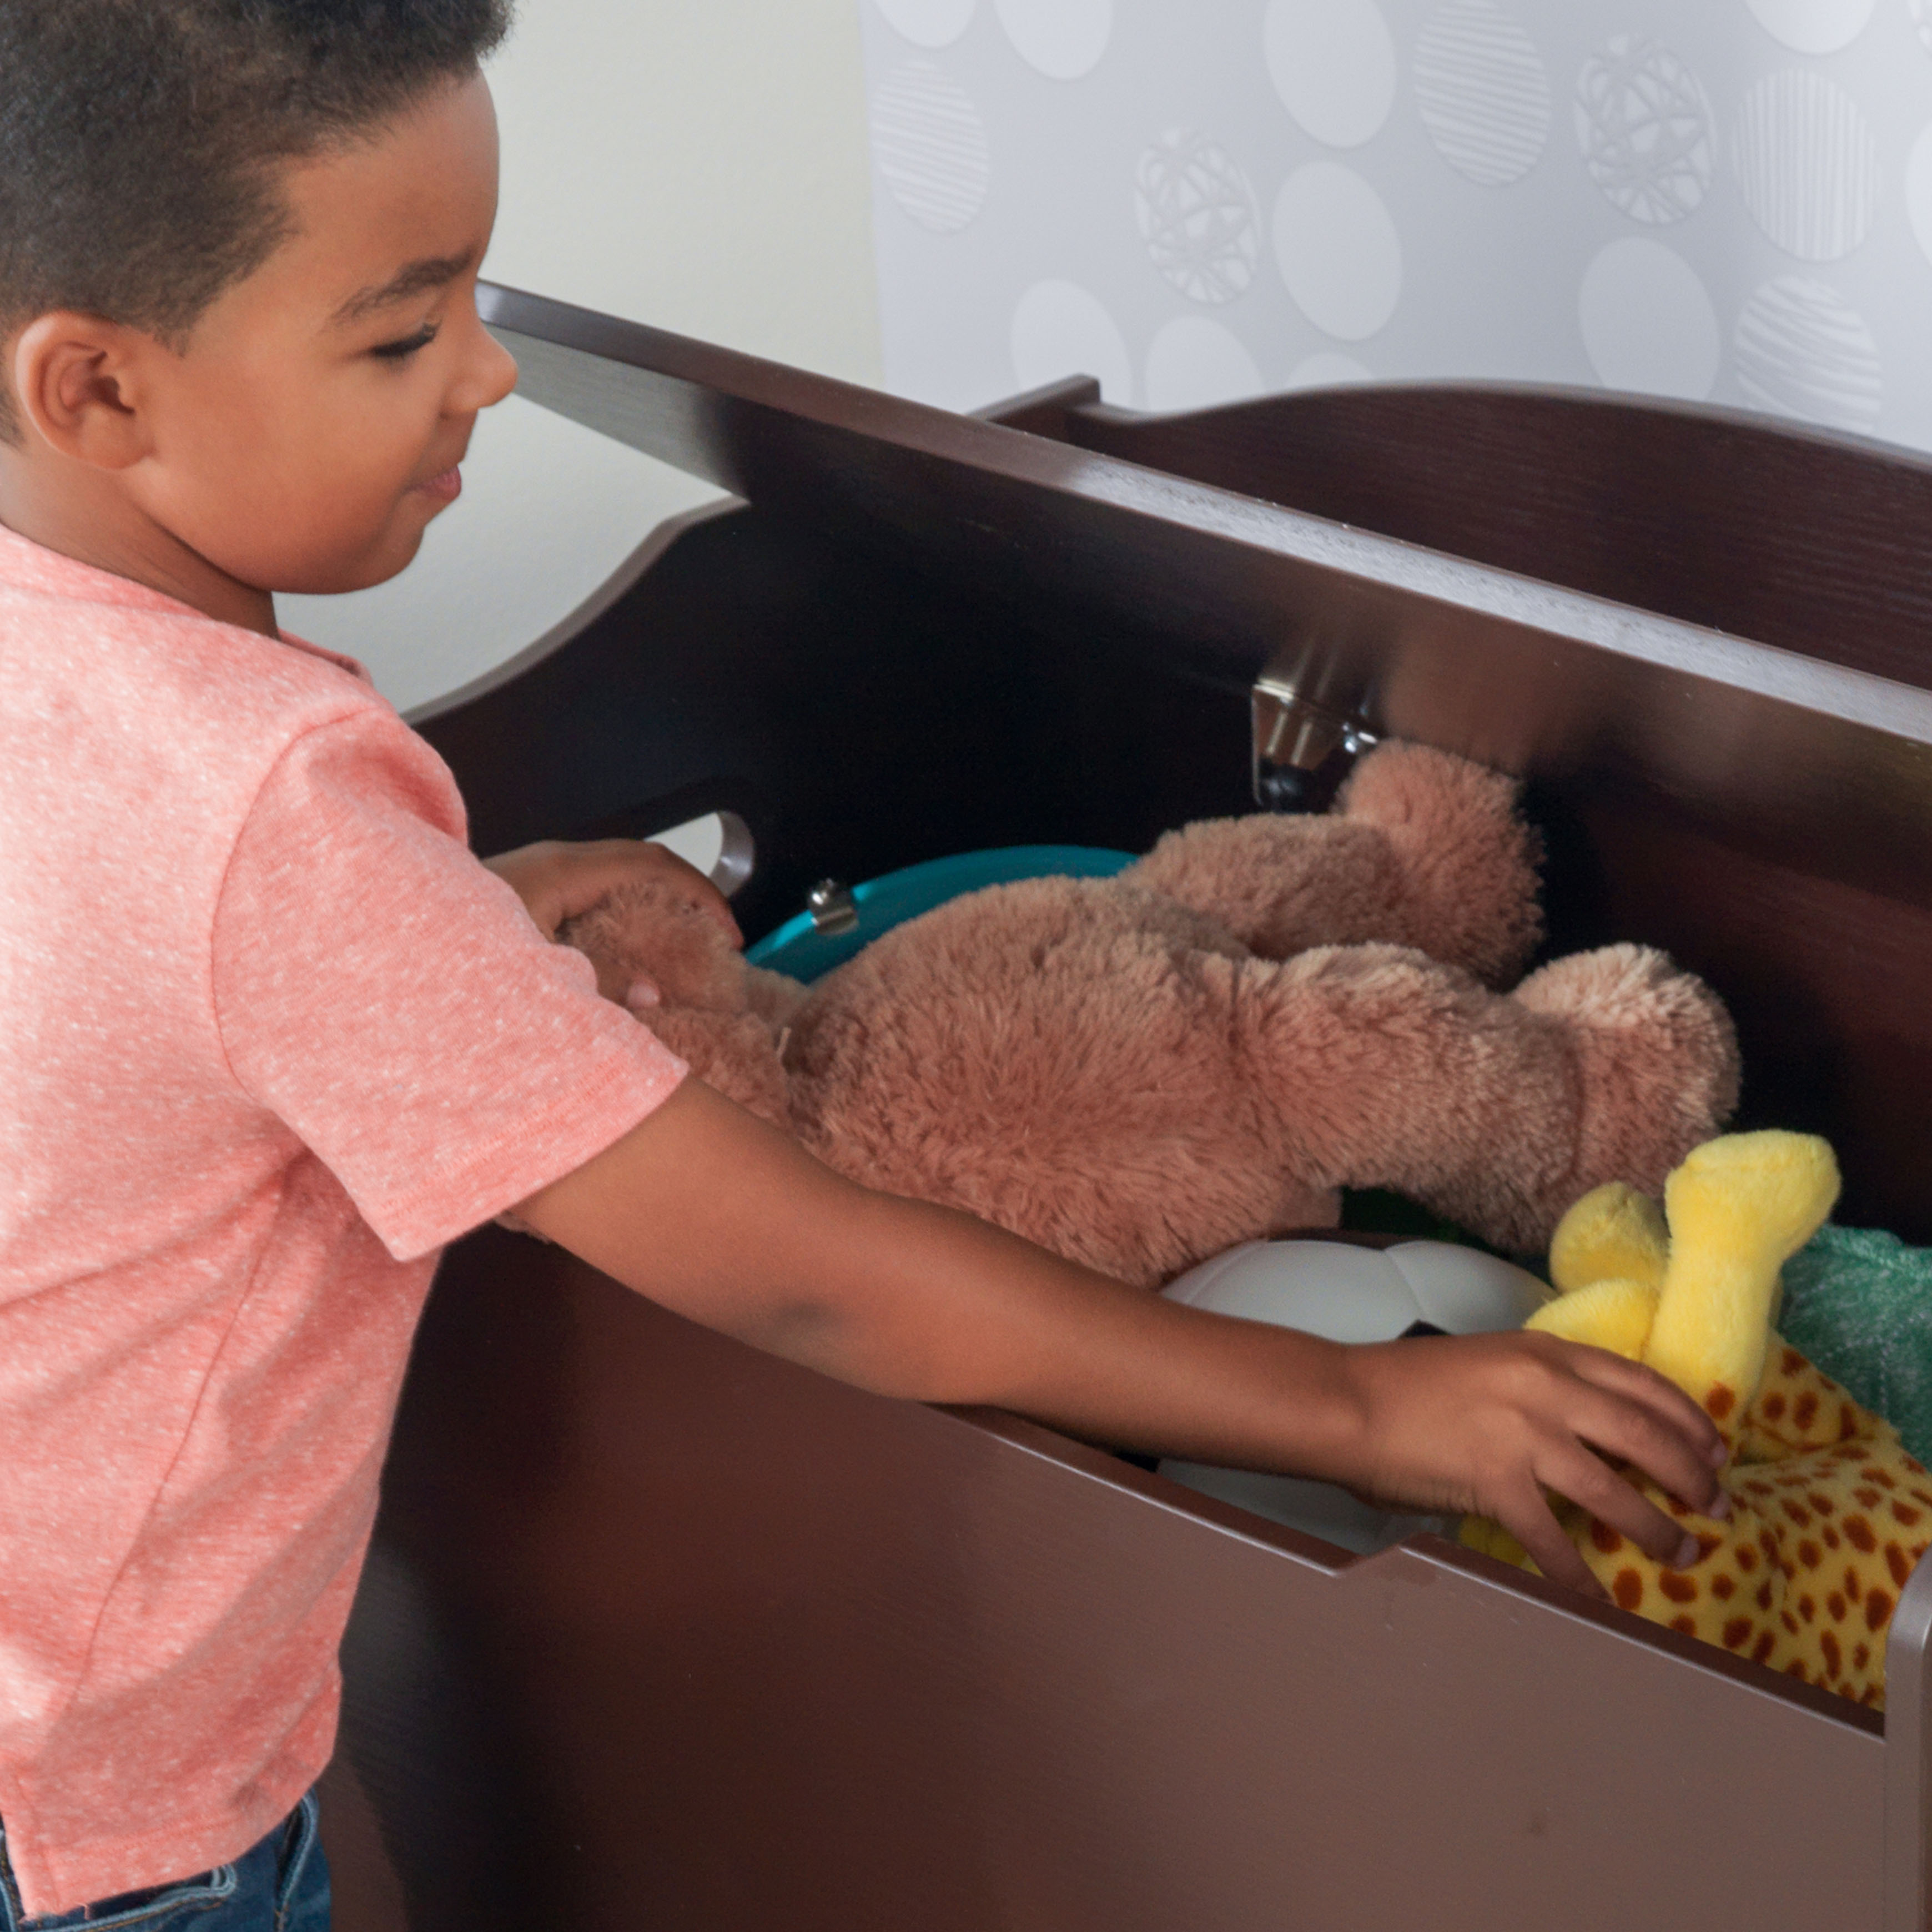 Kidkraft austin toy box natural 14953 - Kidkraft Austin Toy Box Natural 14953 10